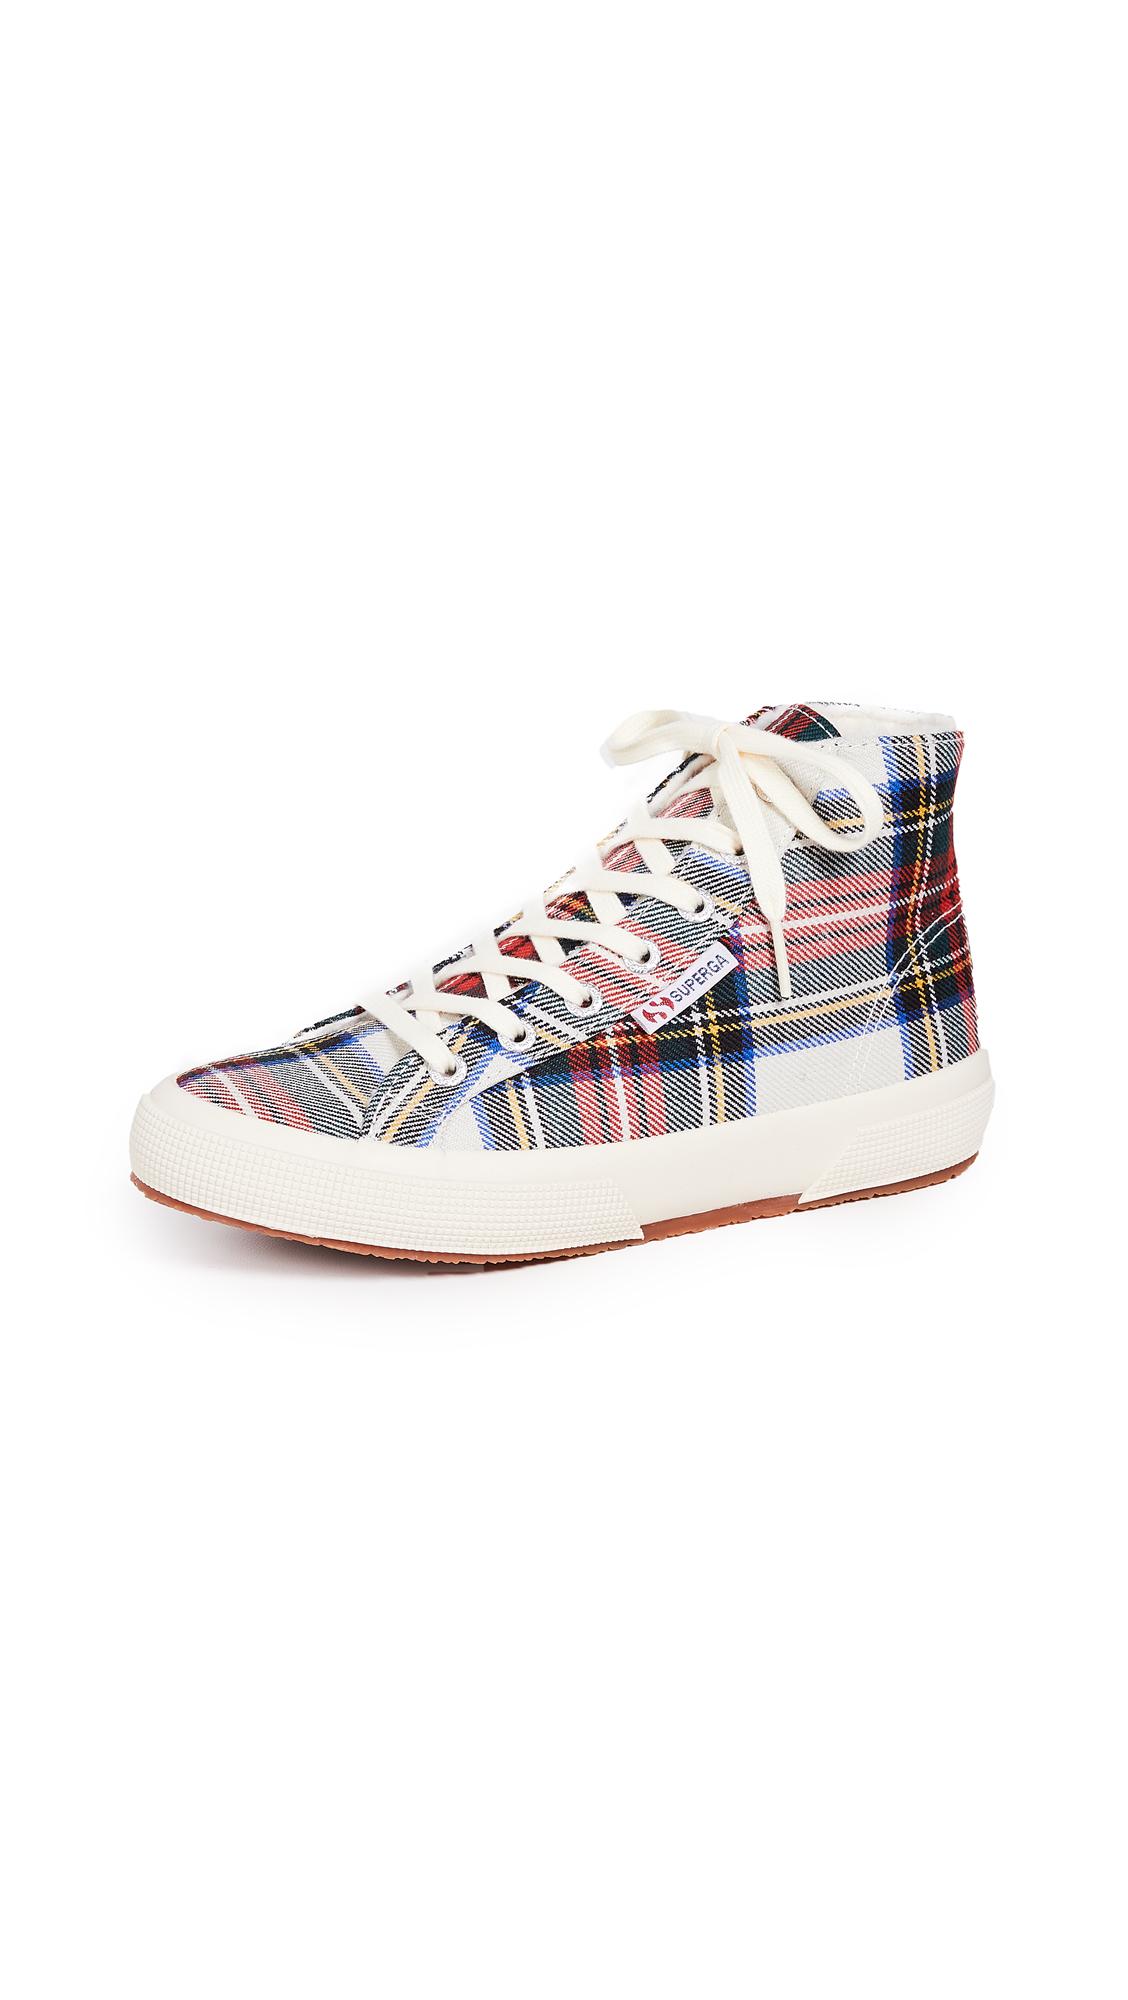 Superga 2795 Tartan High Top Sneakers